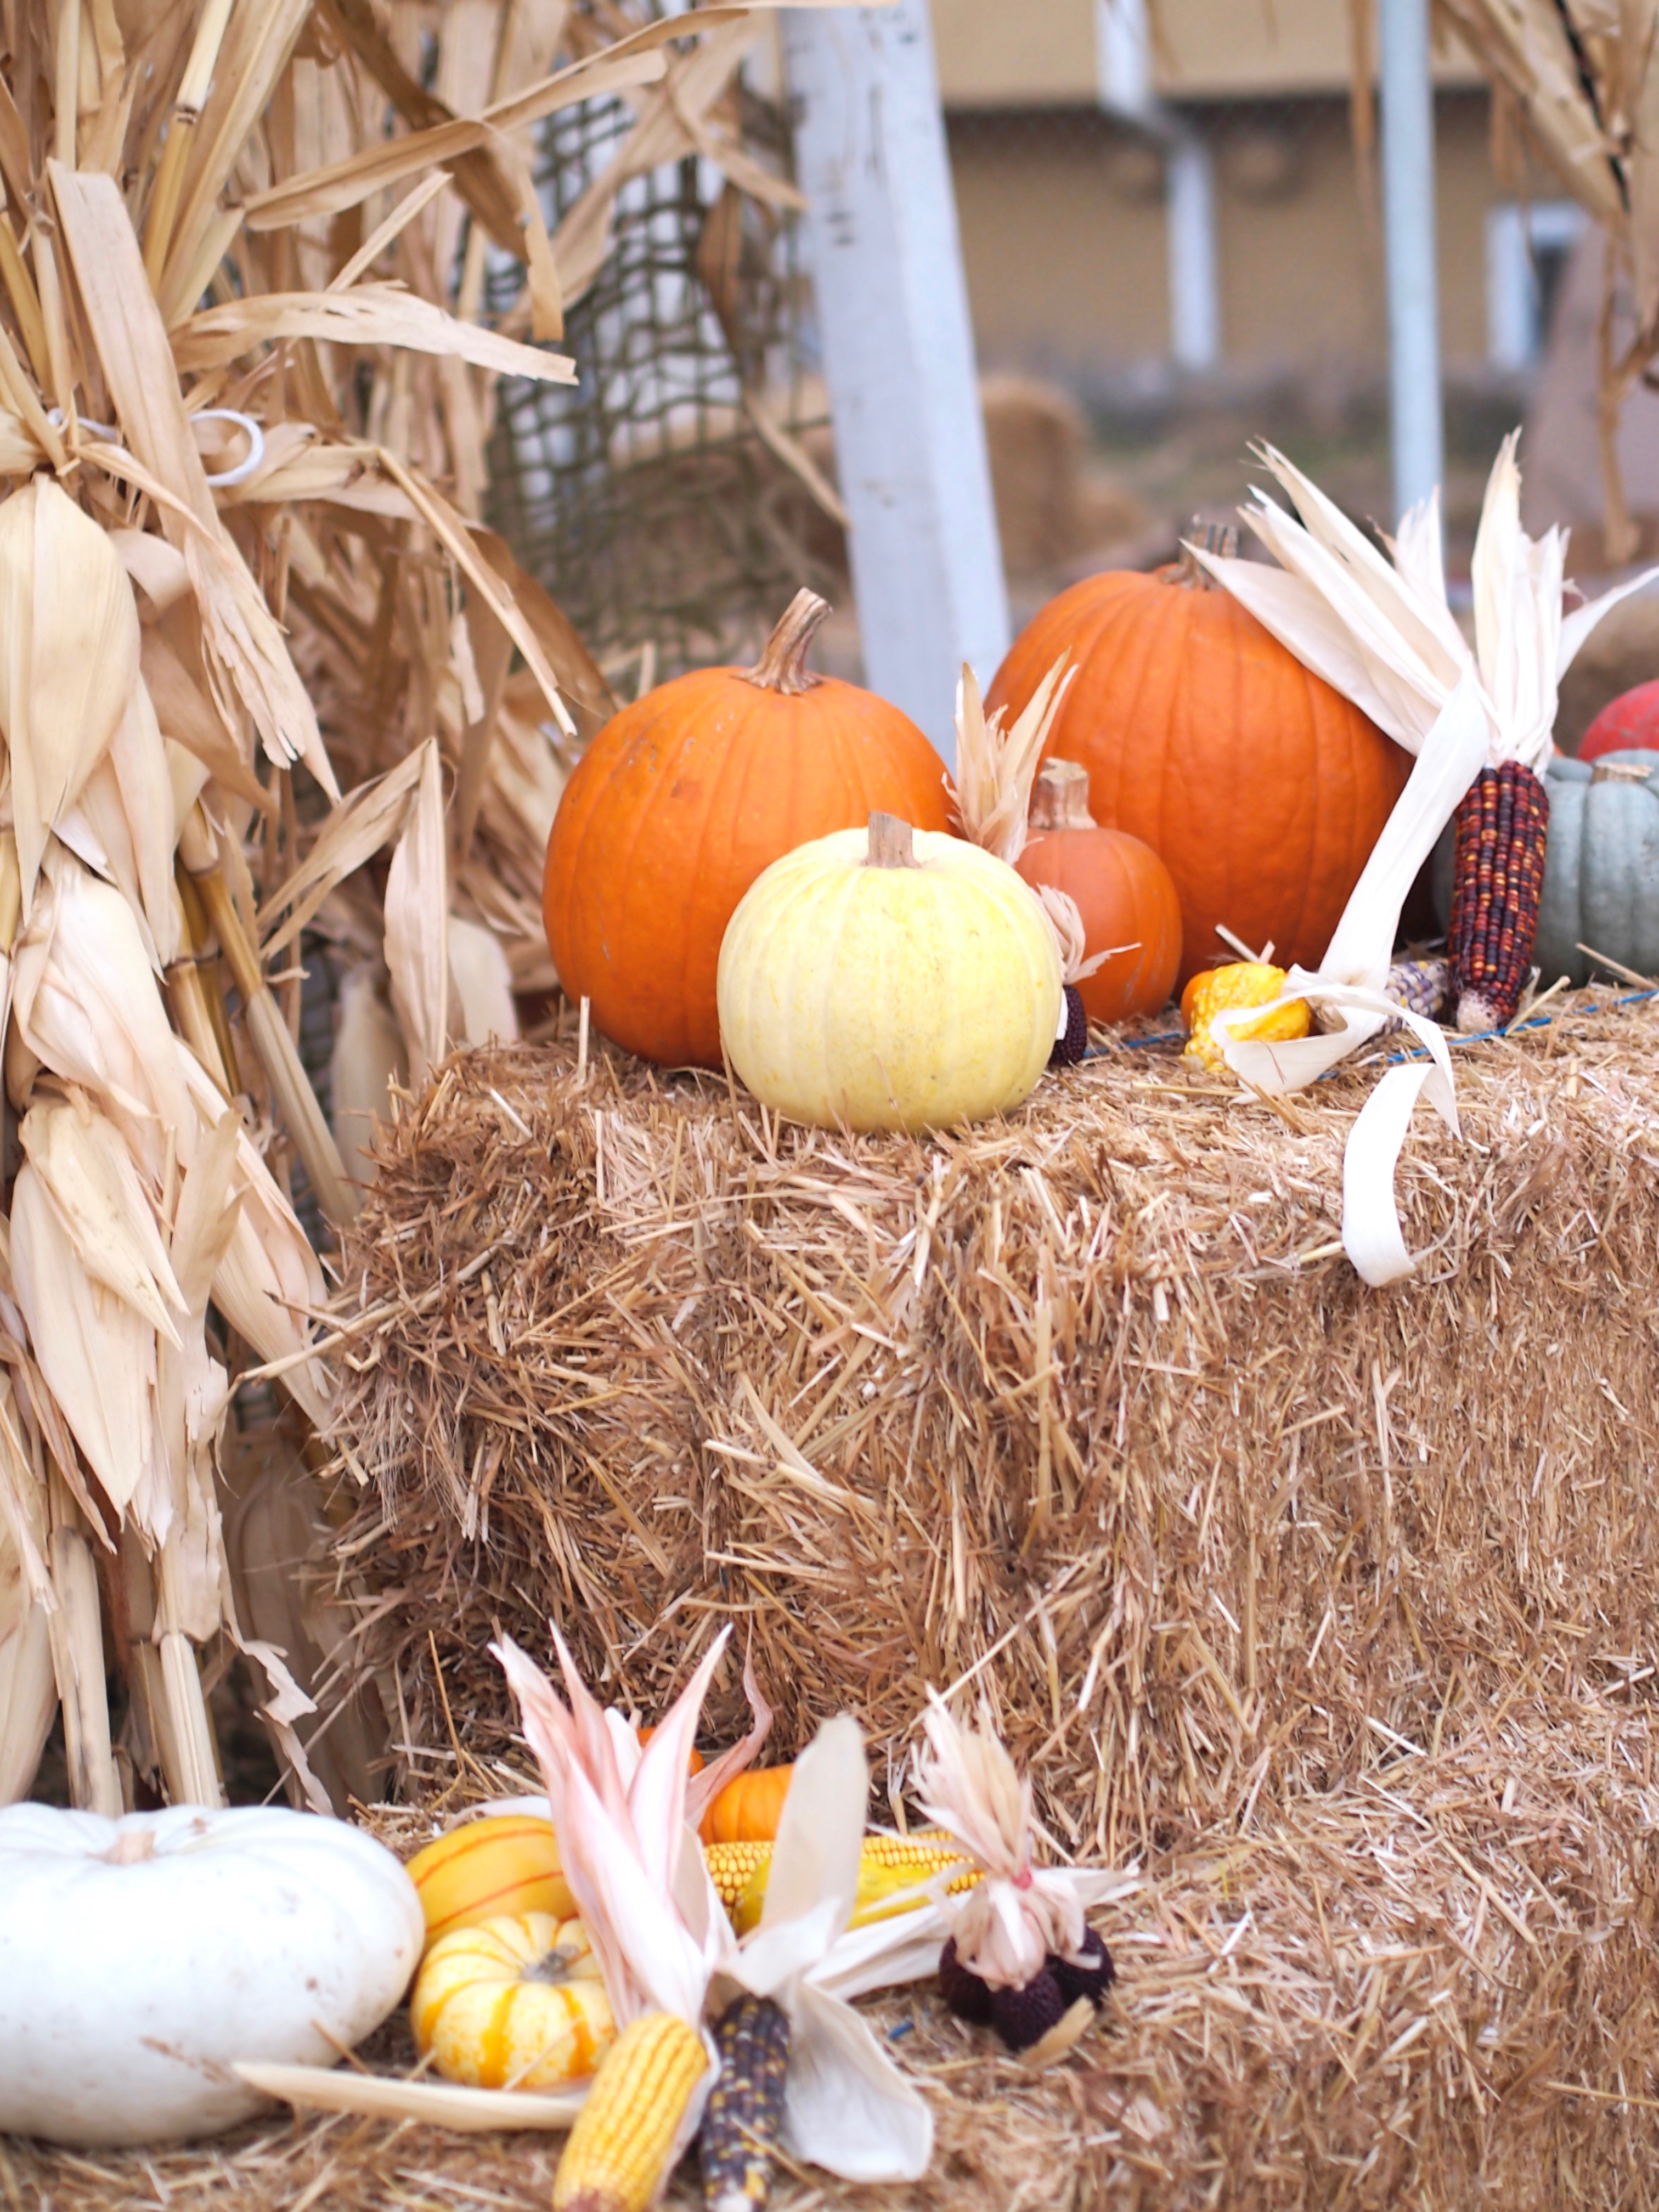 Hay, Pumpkin, Games, cashmere, burberry, boots, Tory Burch, fun, fall, marshalls